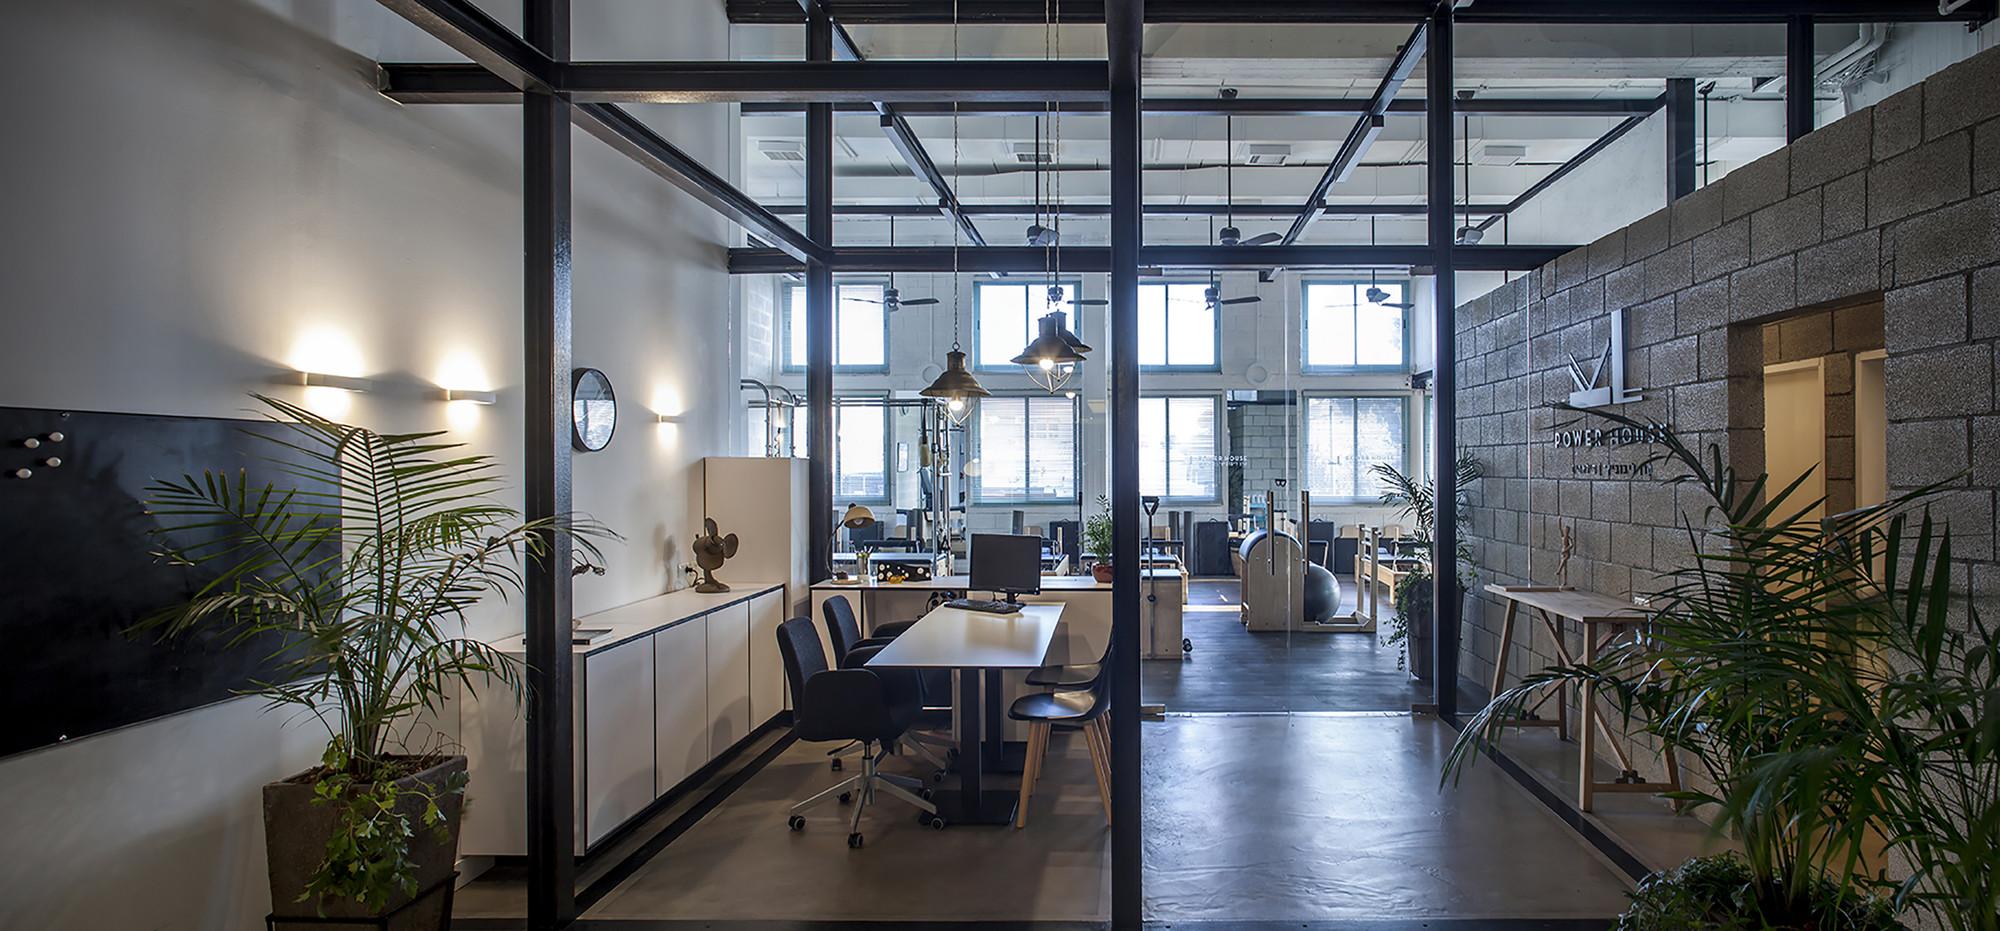 Gallery Of Powerhouse Kl Pilates Studio Jacobs Yaniv Architects 7